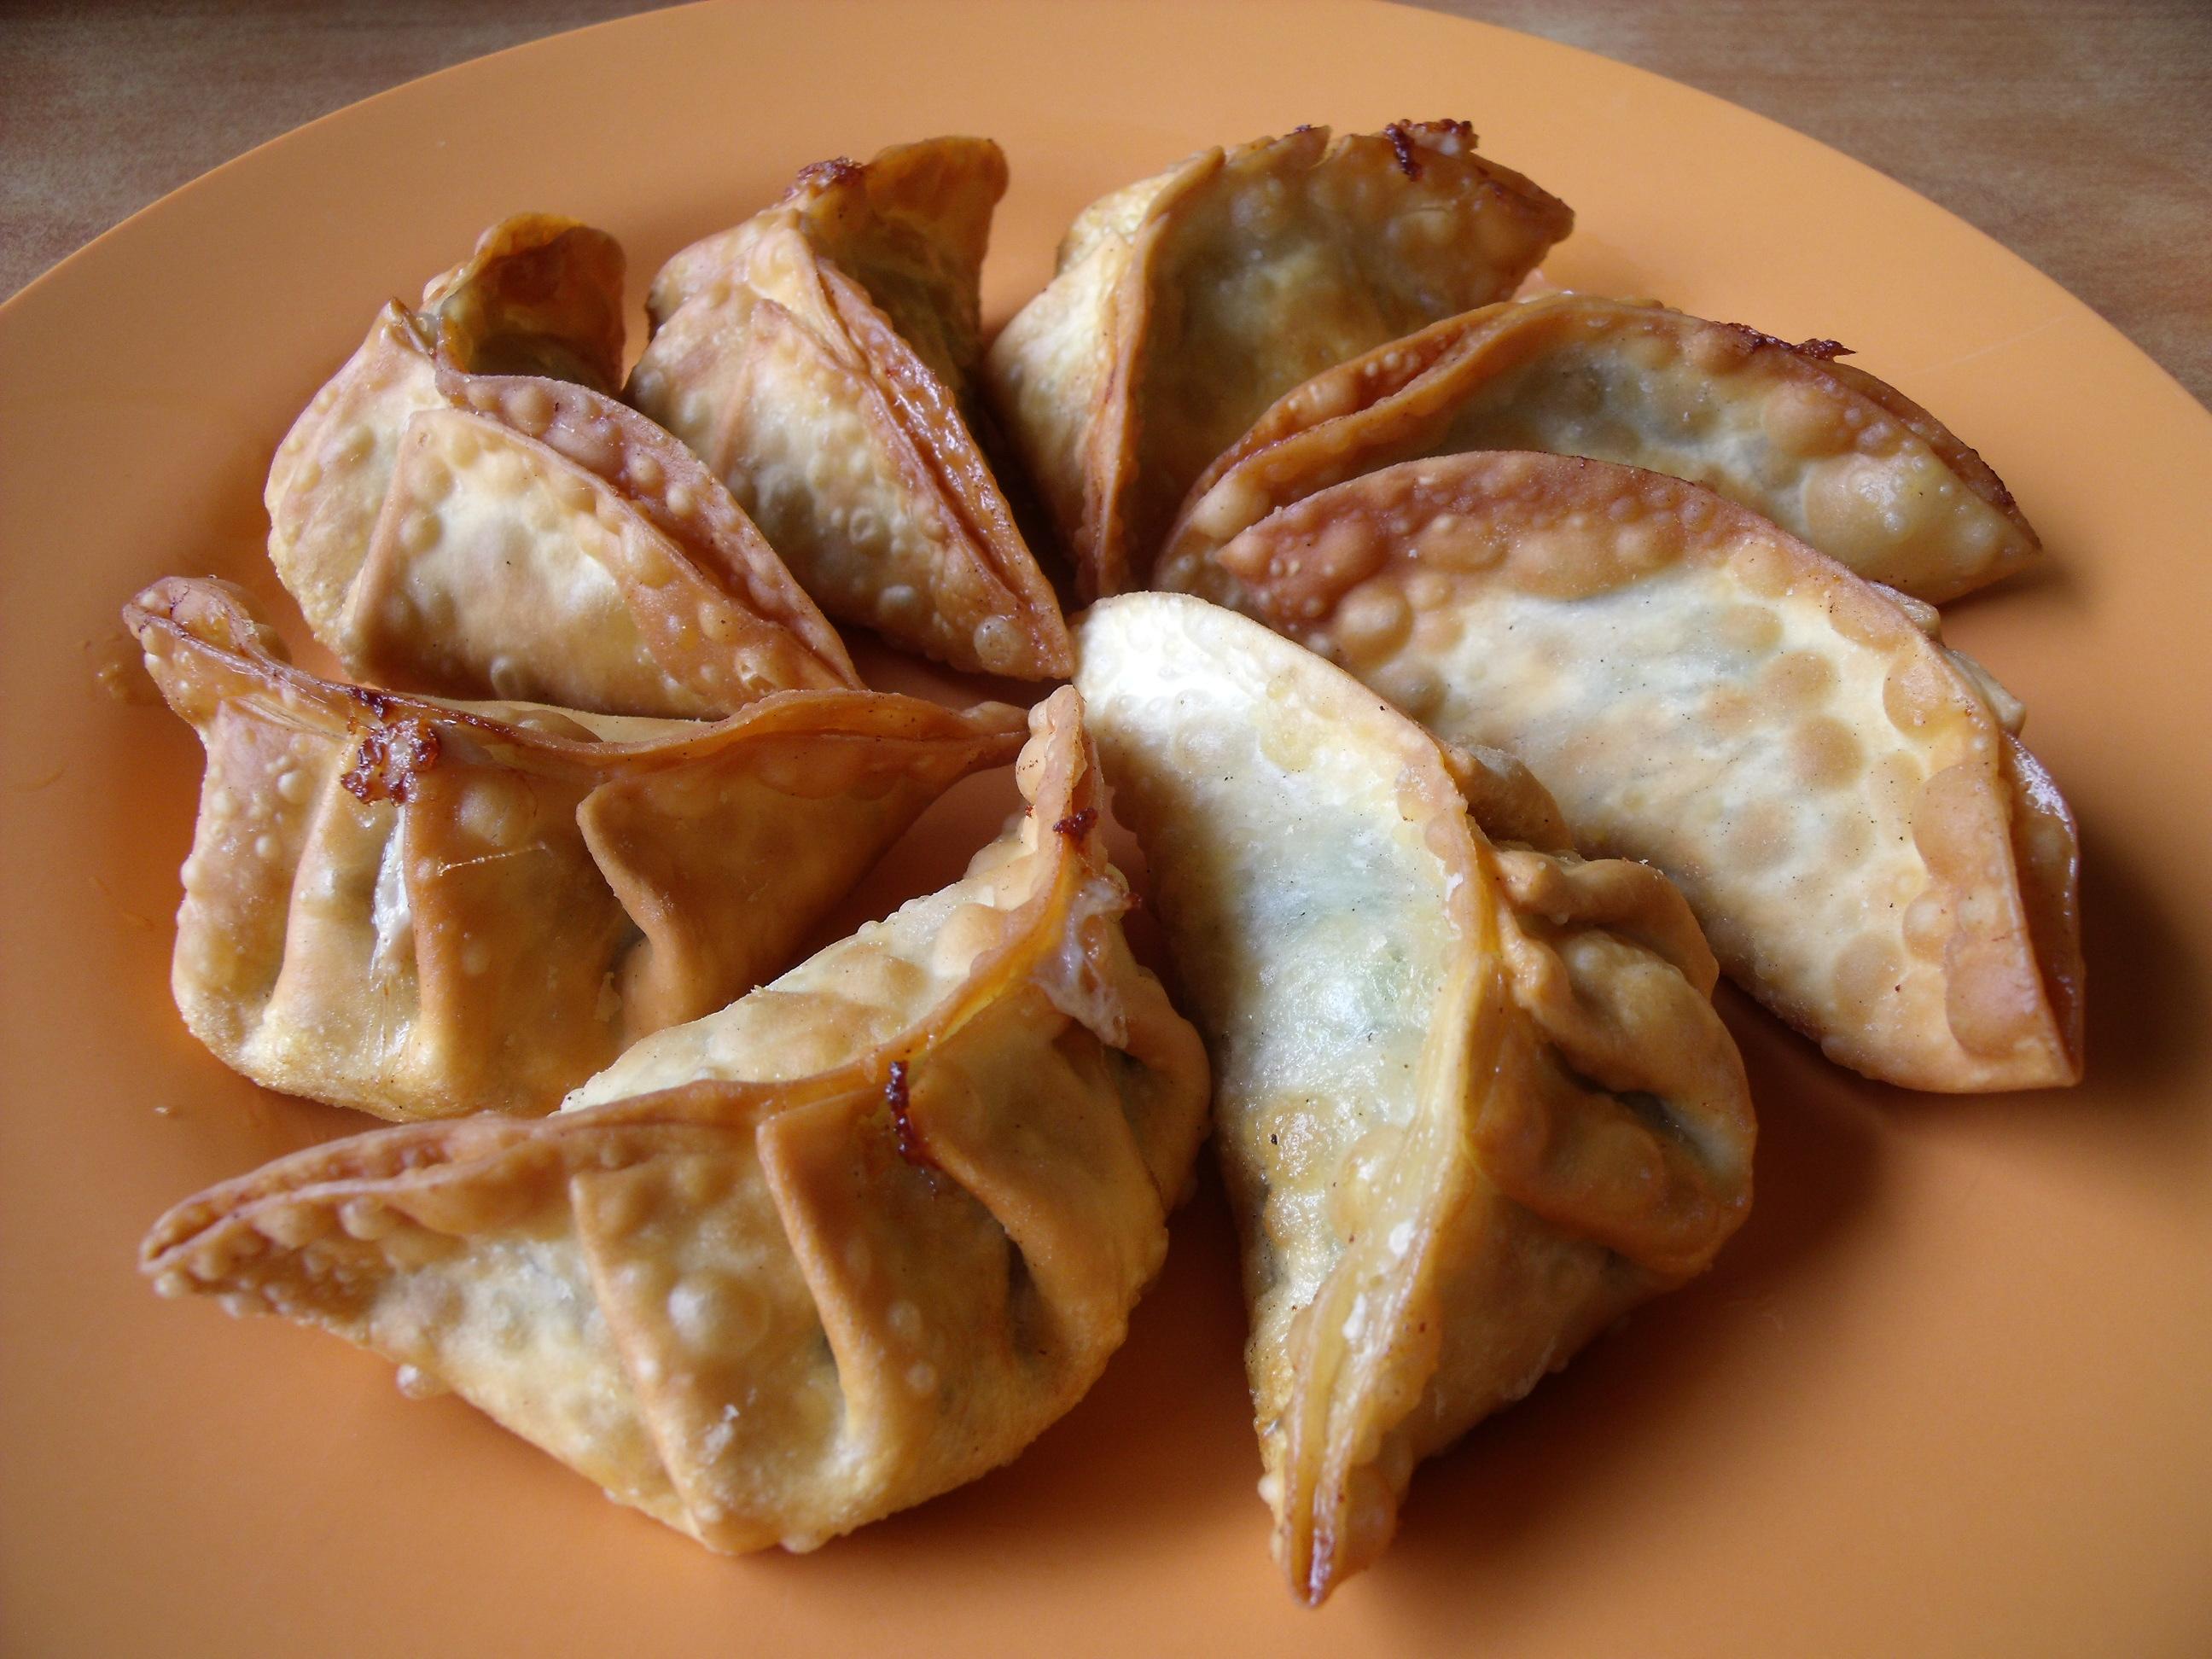 Singapore fried dumplings